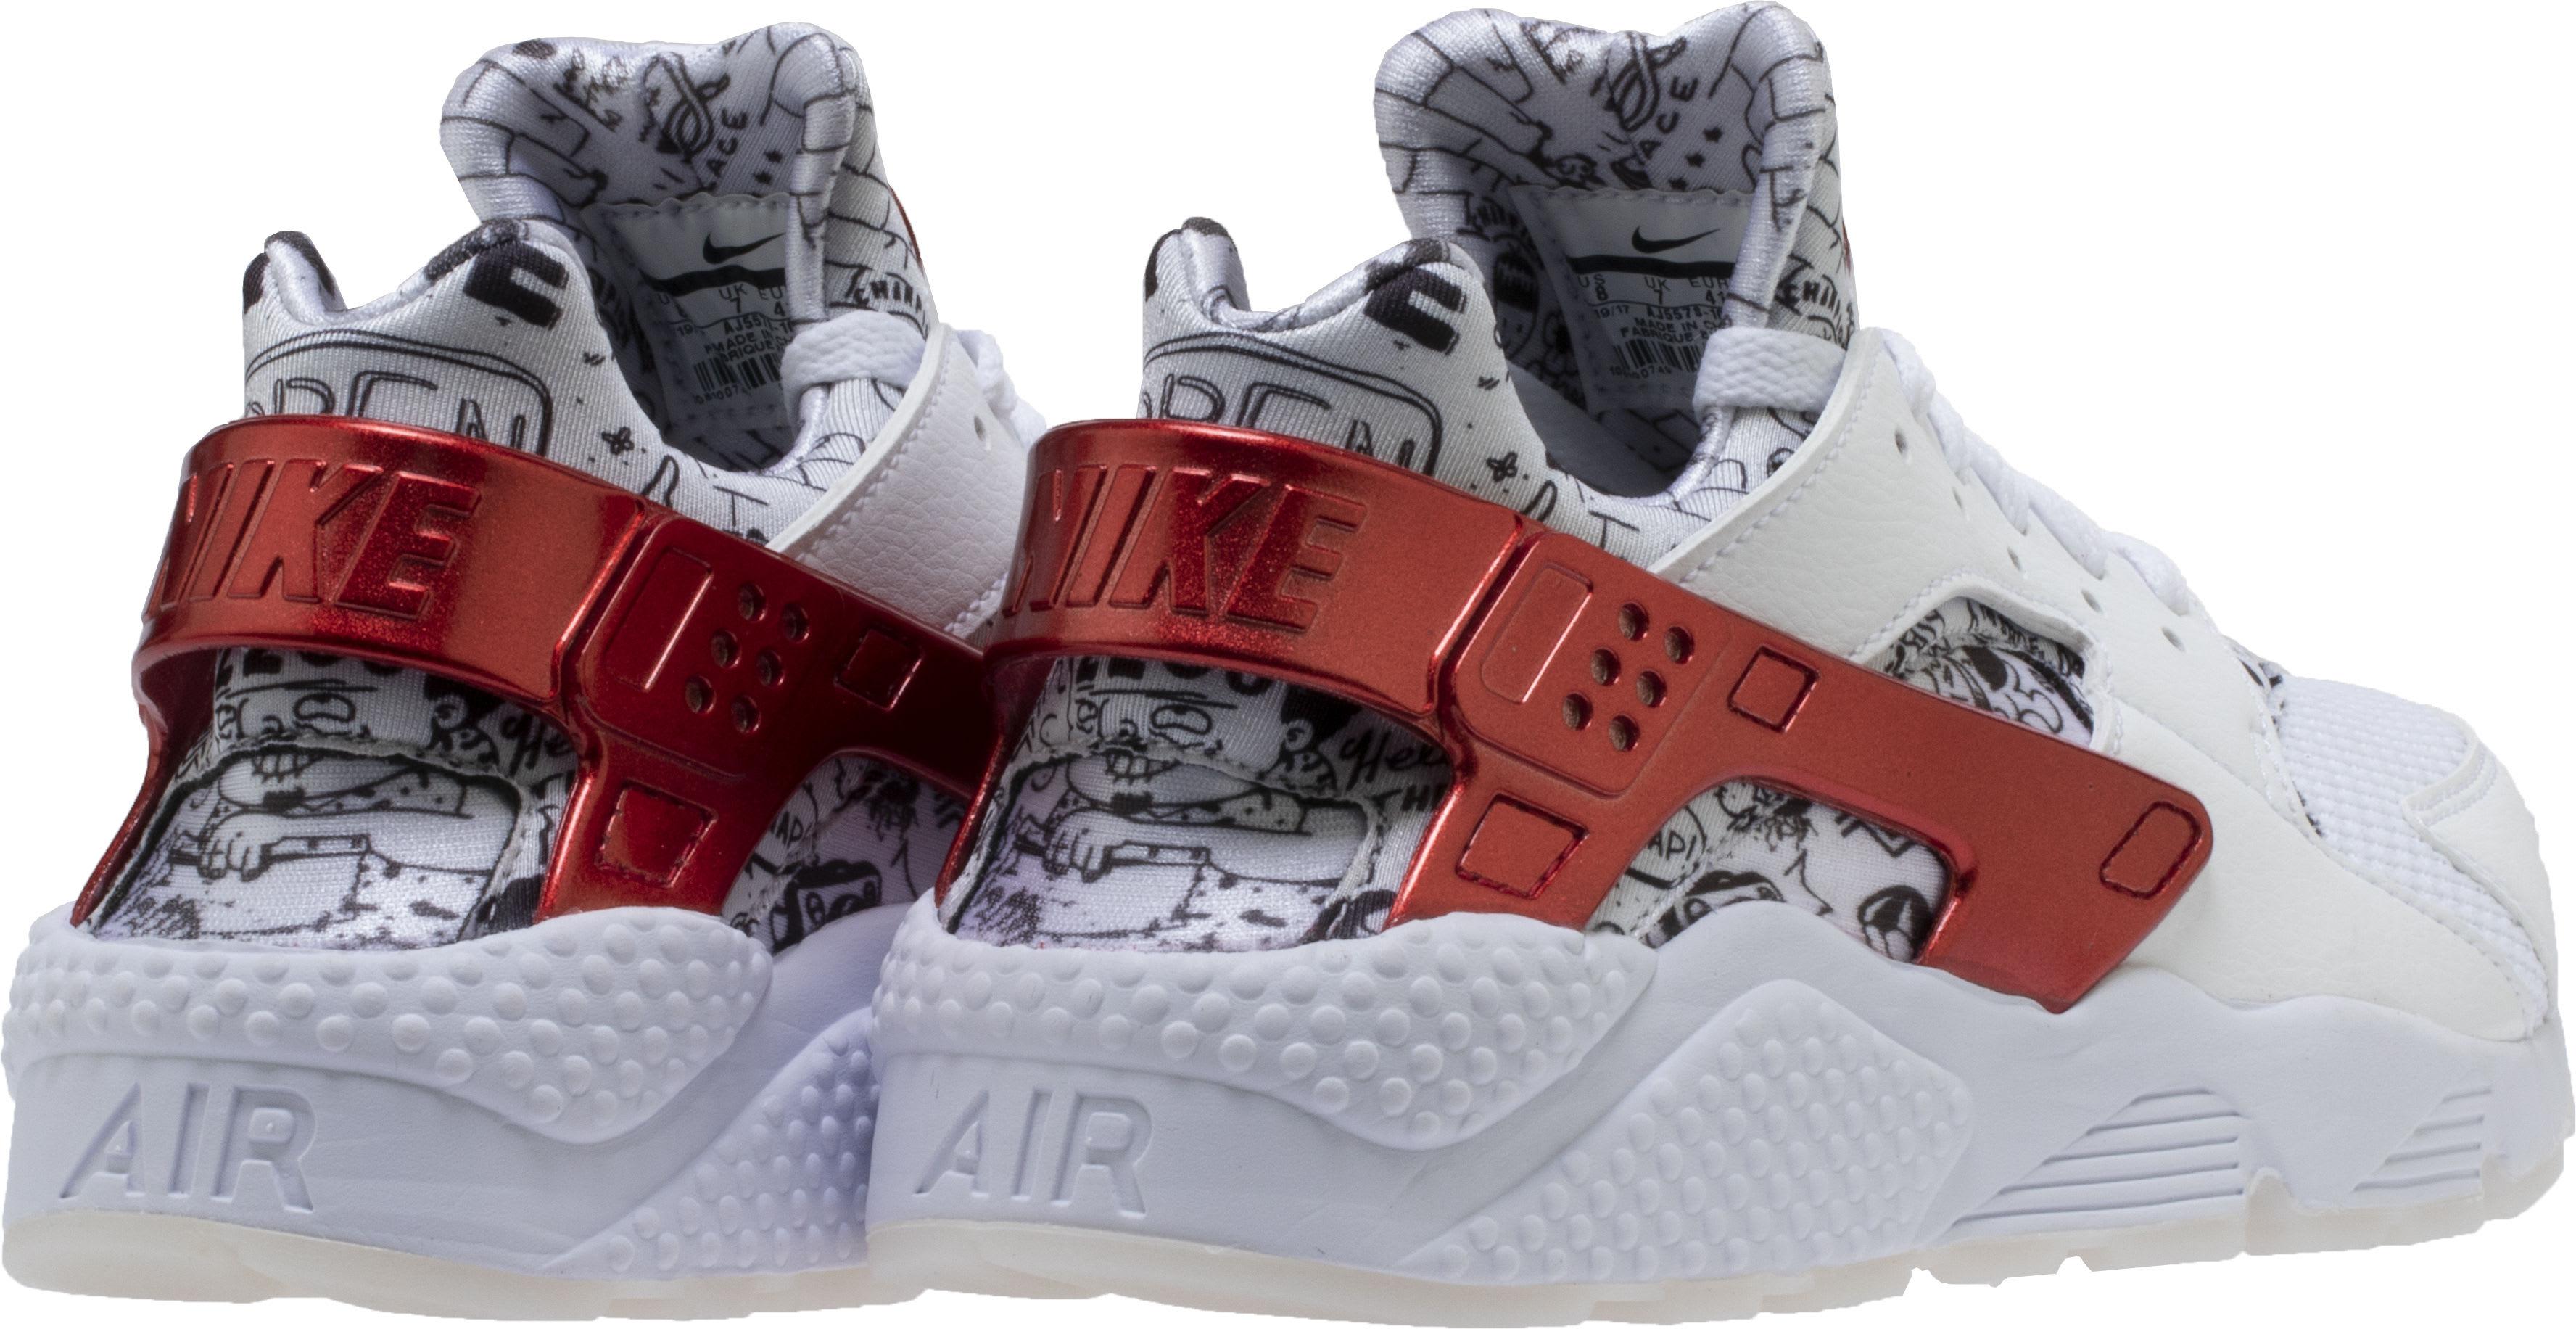 Shoe Palace x Nike Air Huarache White/Red/Platinum 'Joonbug' AJ5578-101 (Heel)